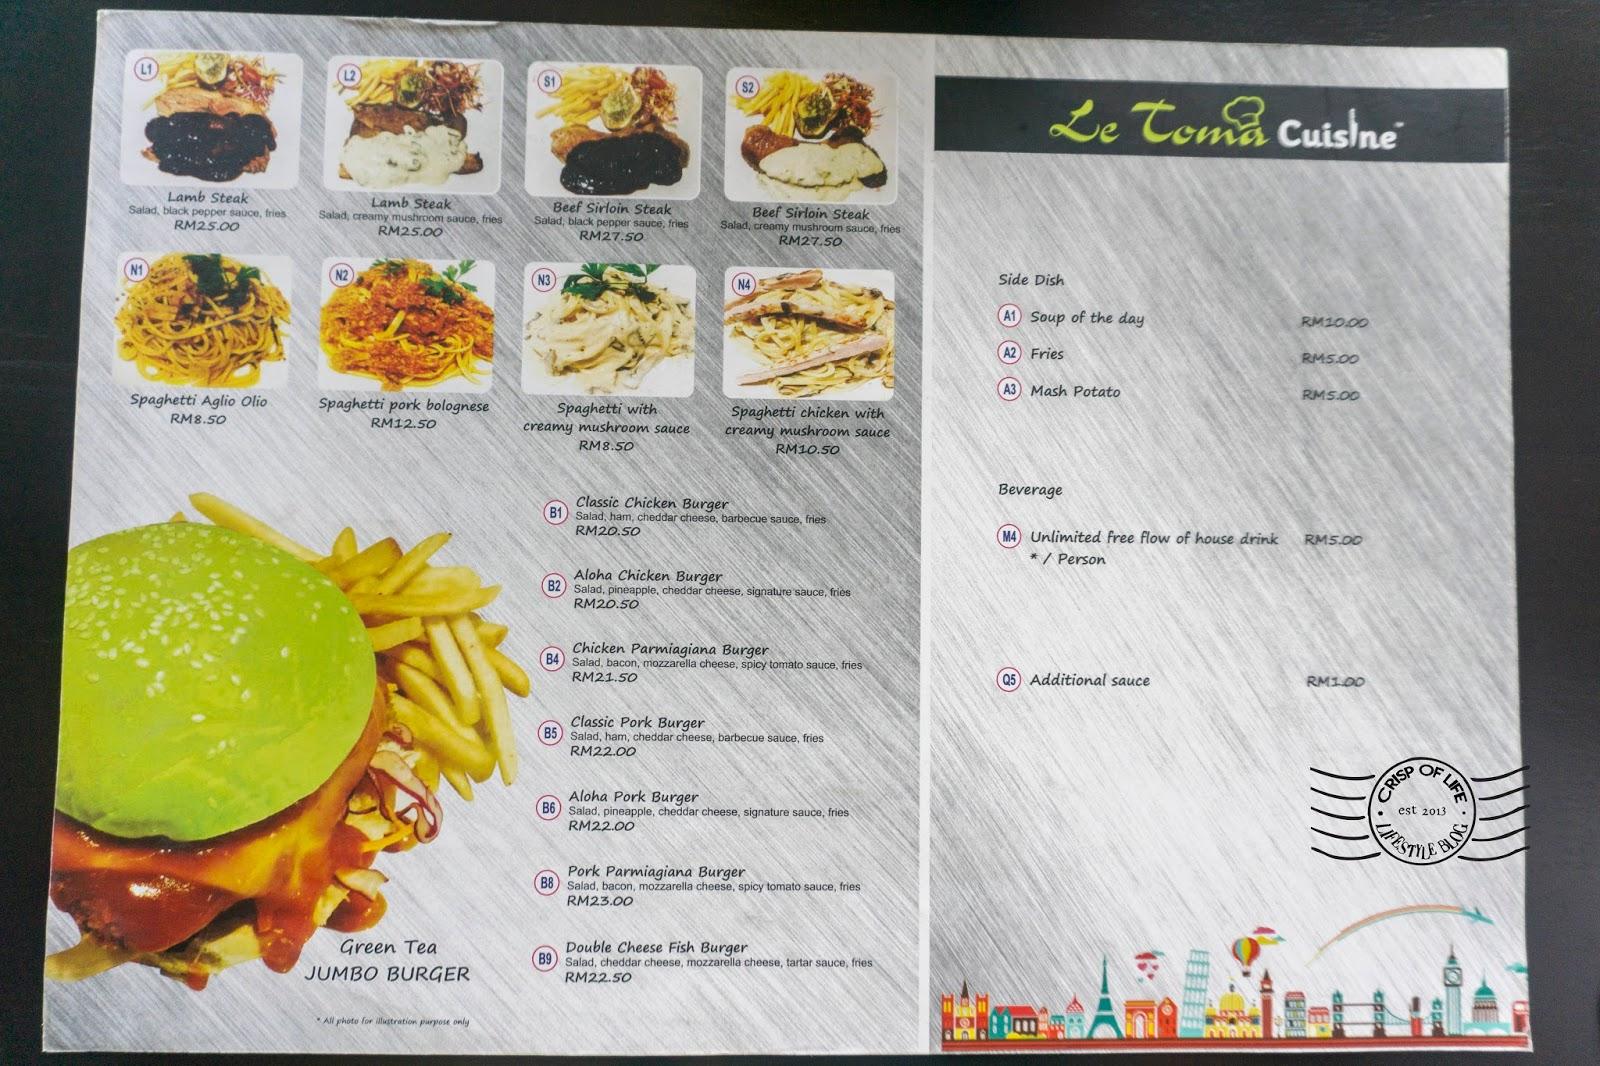 Le Toma Cuisine @ Automall & Jalan Van Praagh, Penang